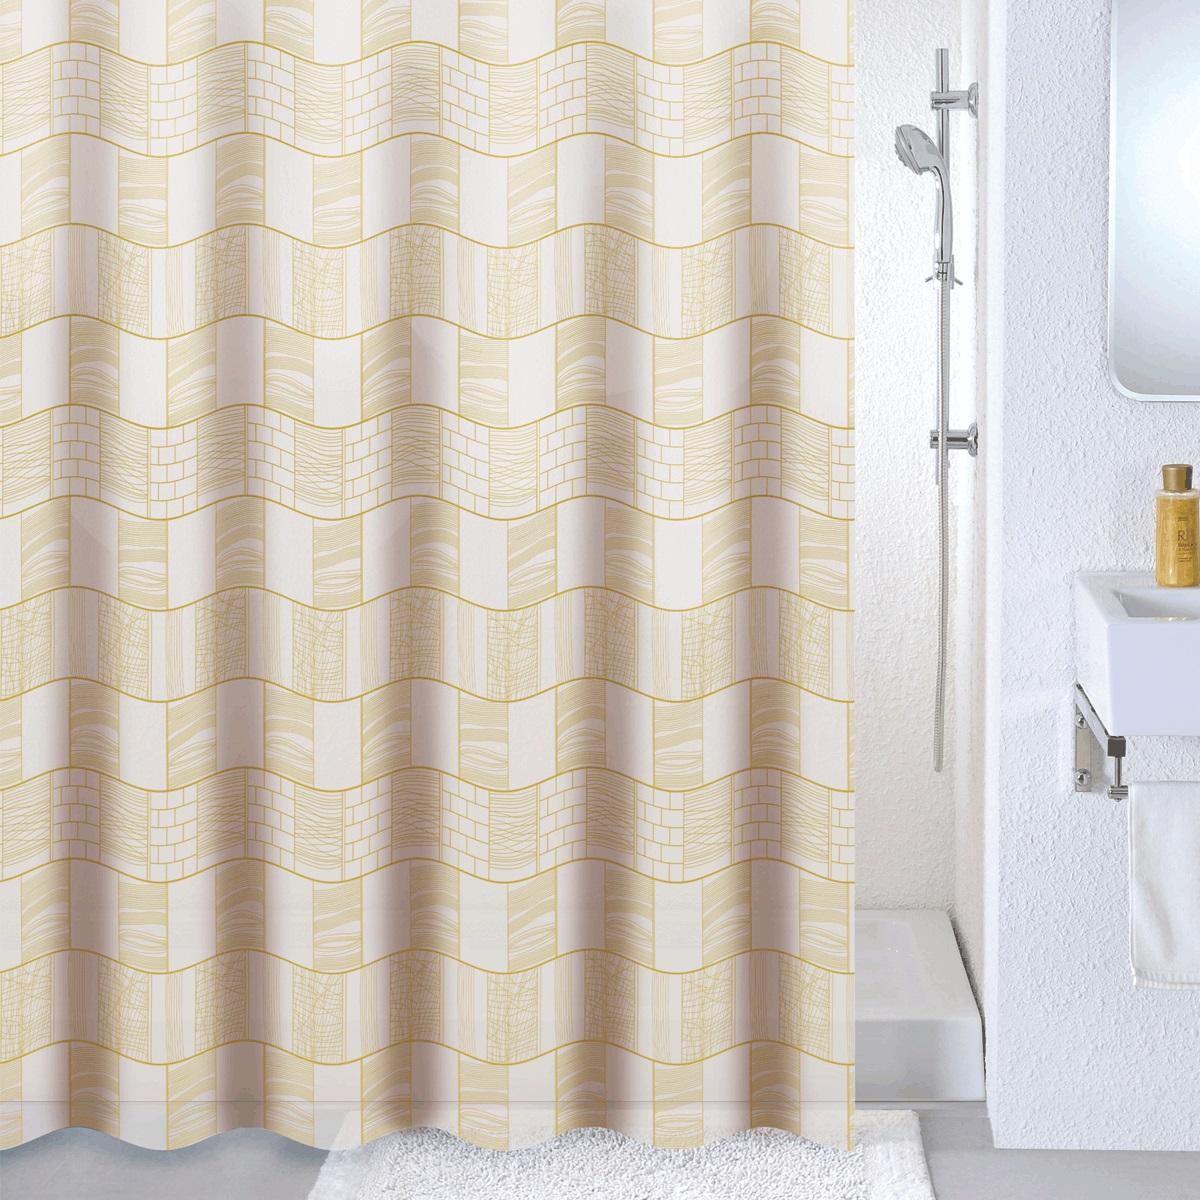 Штора для ванной Milardo Brick wall, цвет: бежевый , 180 x 180 см двойная штора для ванной